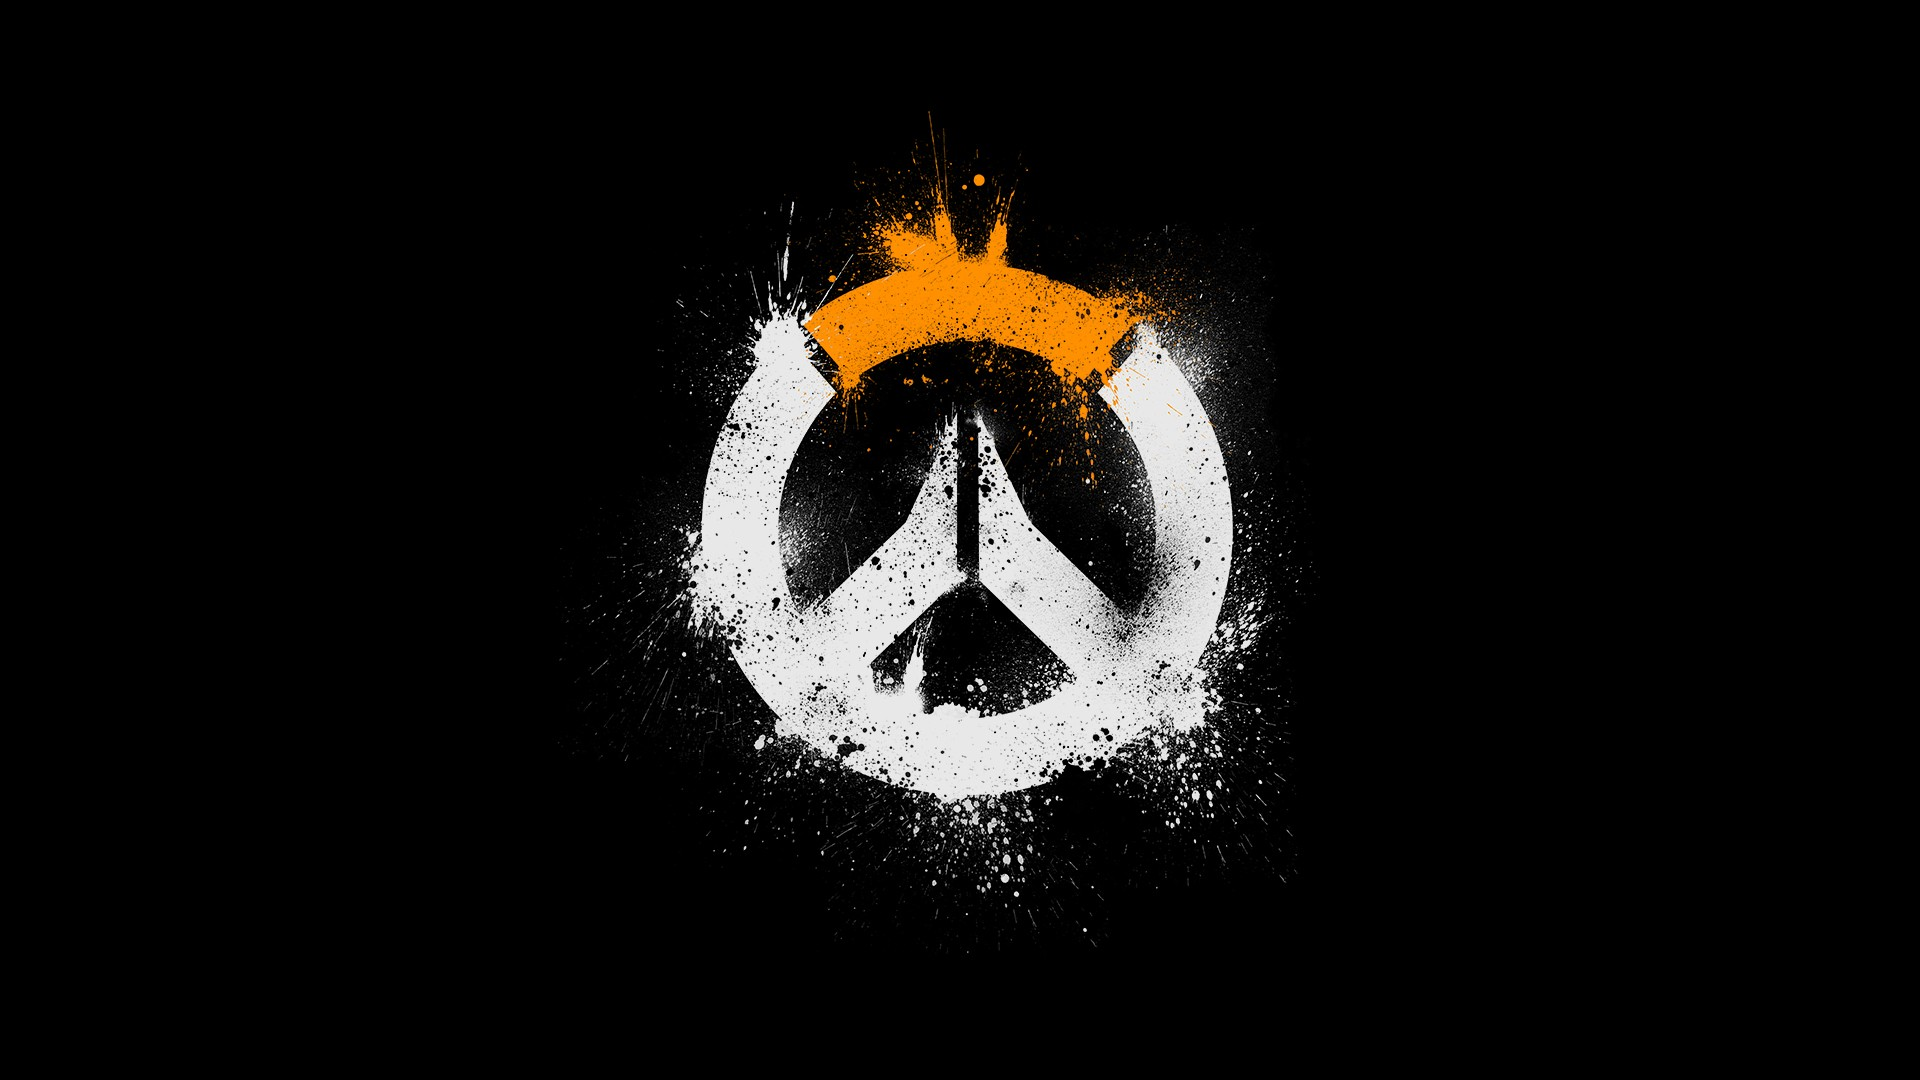 Overwatch Logo wallpaper ·① Download free cool HD ...